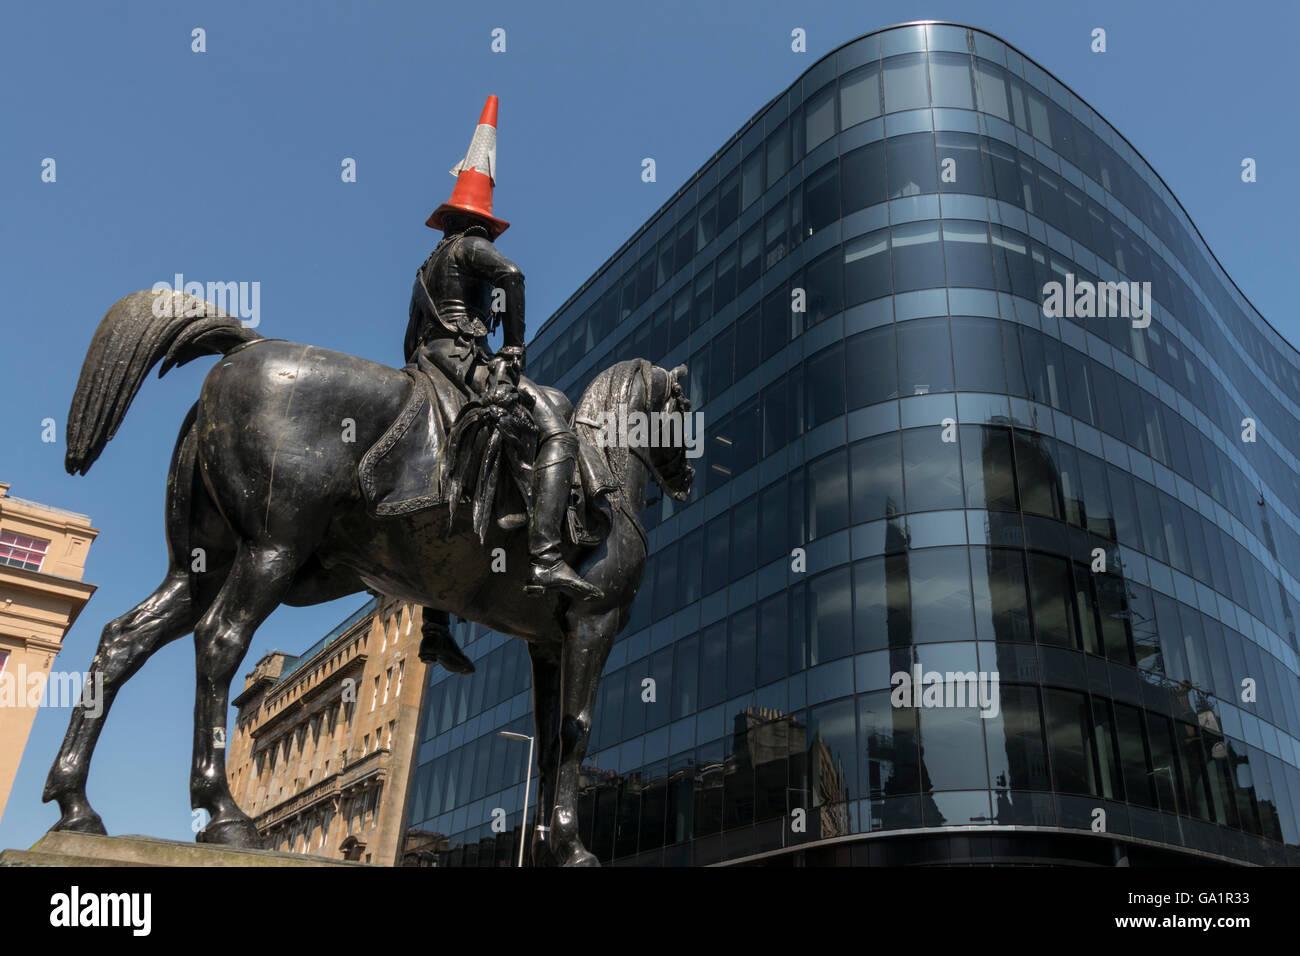 Statue of Duke of Wellington with traffic cone on head, facing modern office block, Glasgow, Scotland, UK, - Stock Image